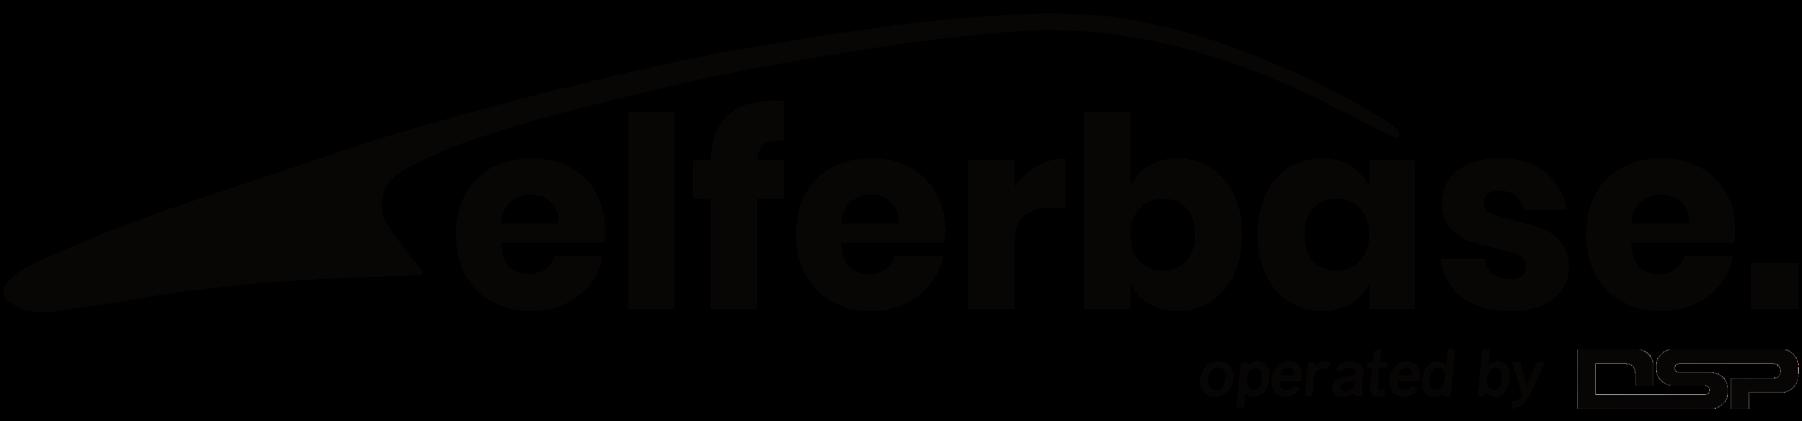 elferbase.de-Logo